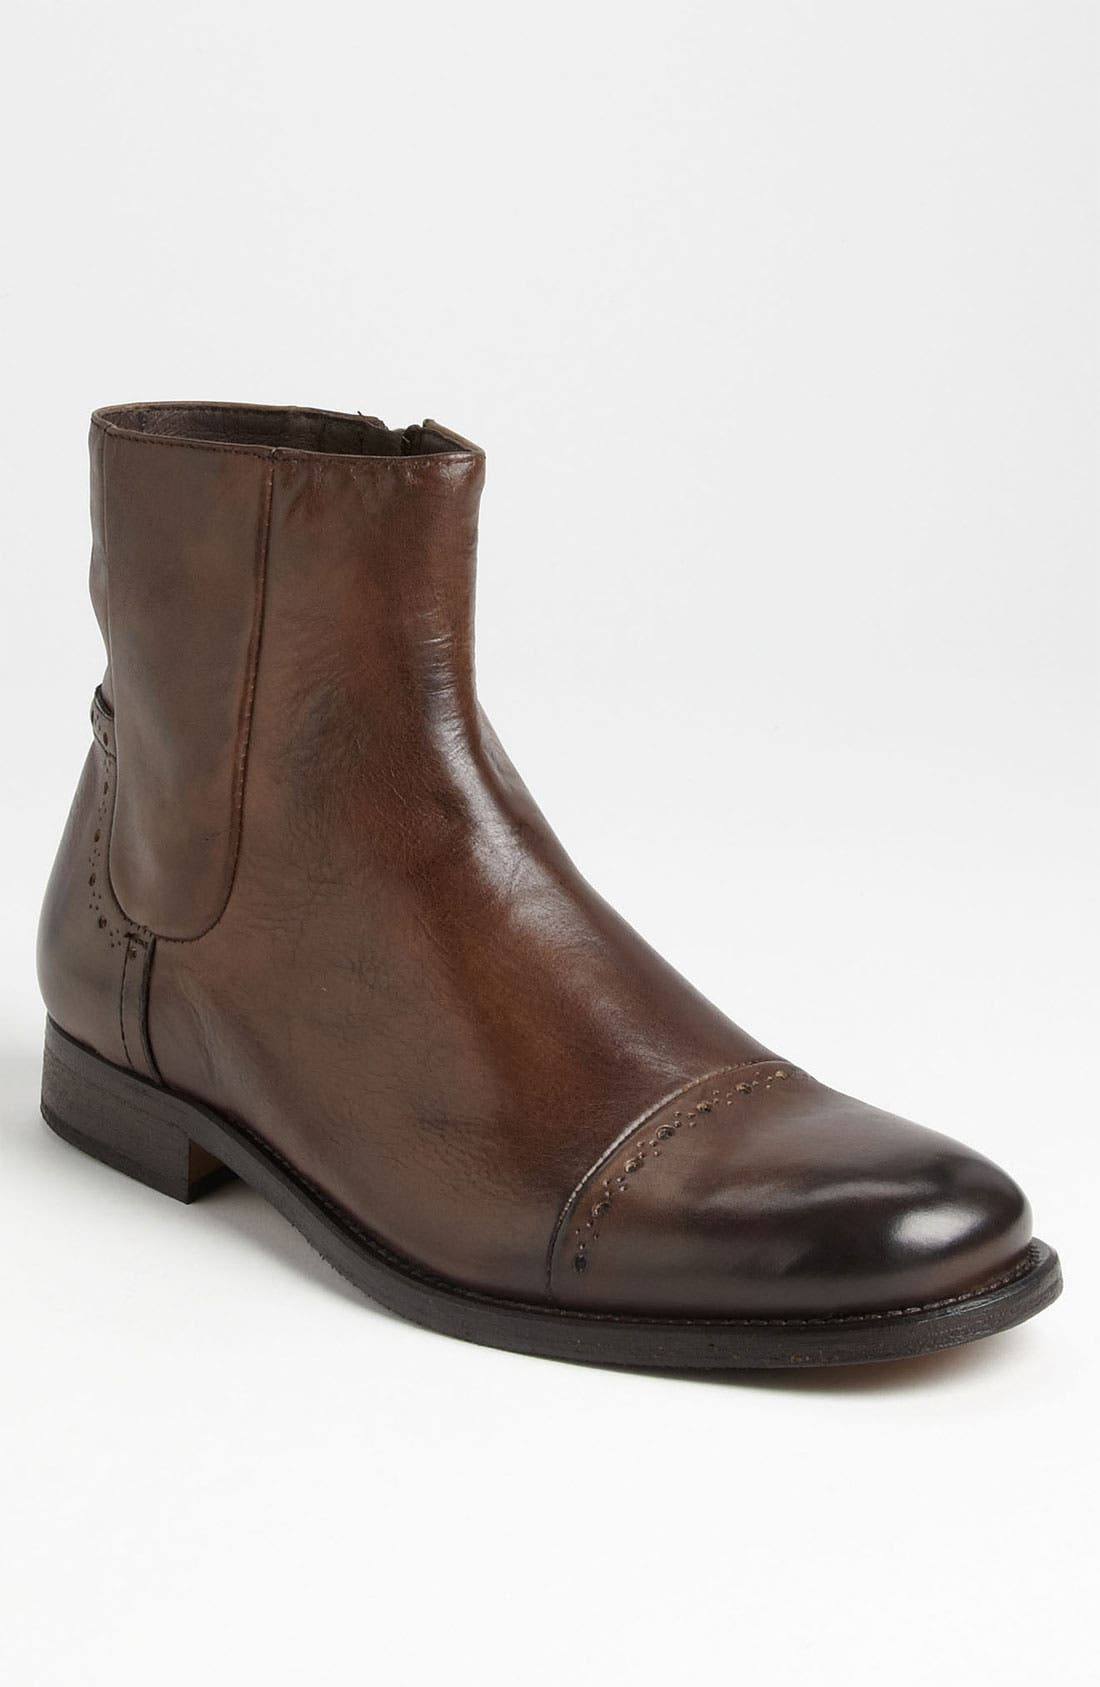 Alternate Image 1 Selected - Bacco Bucci 'Dafne' Cap Toe Boot (Men)